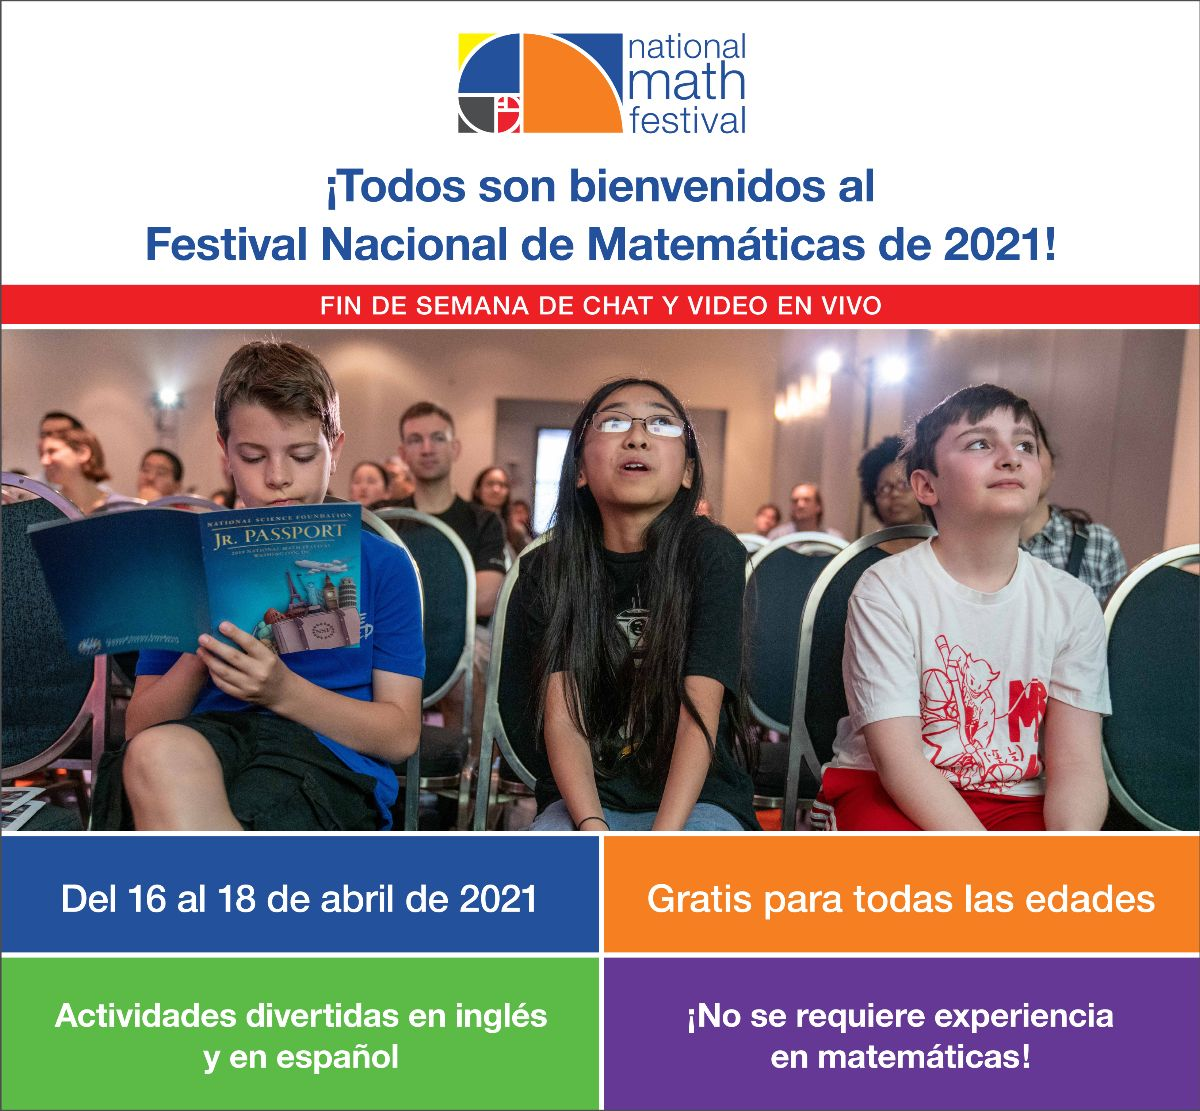 NMF en español